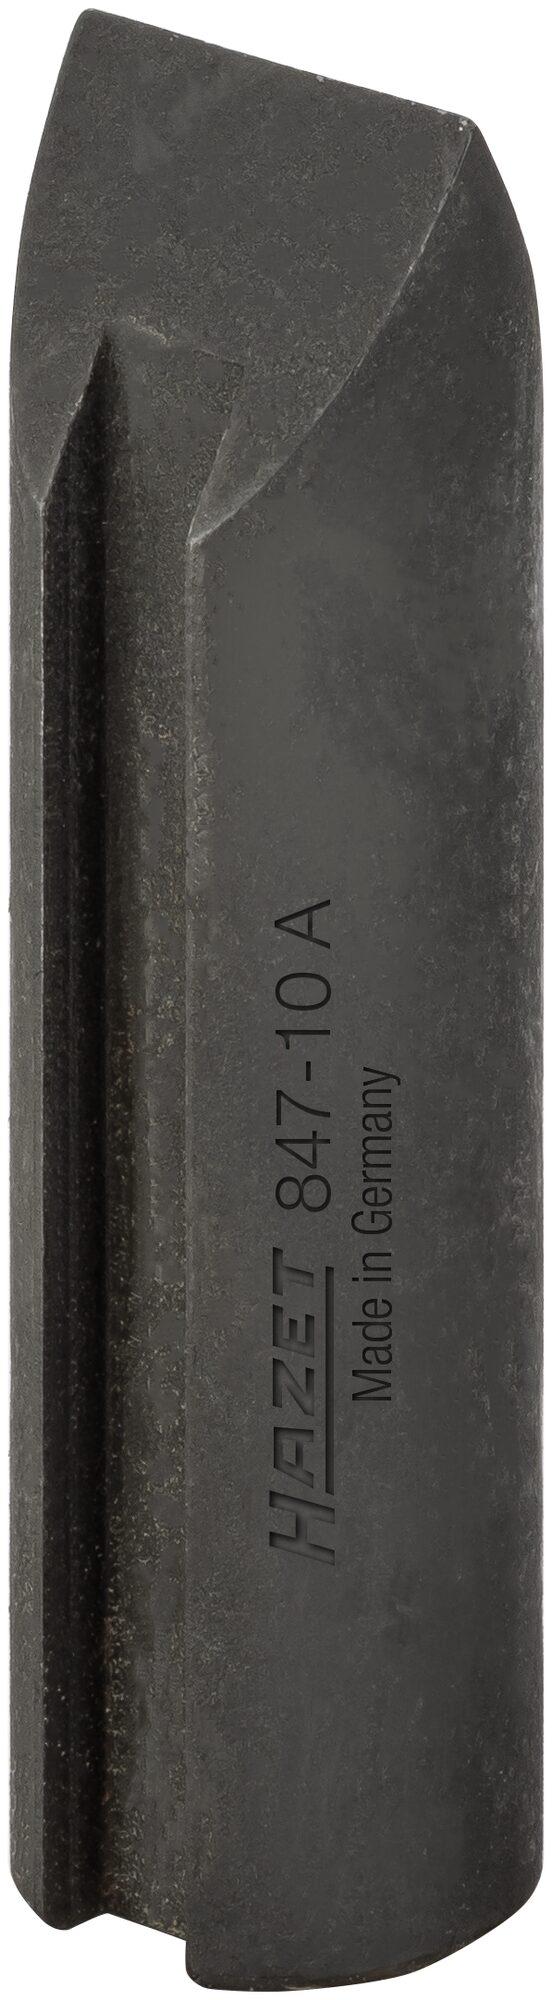 HAZET Ersatzmeißel 847-10A